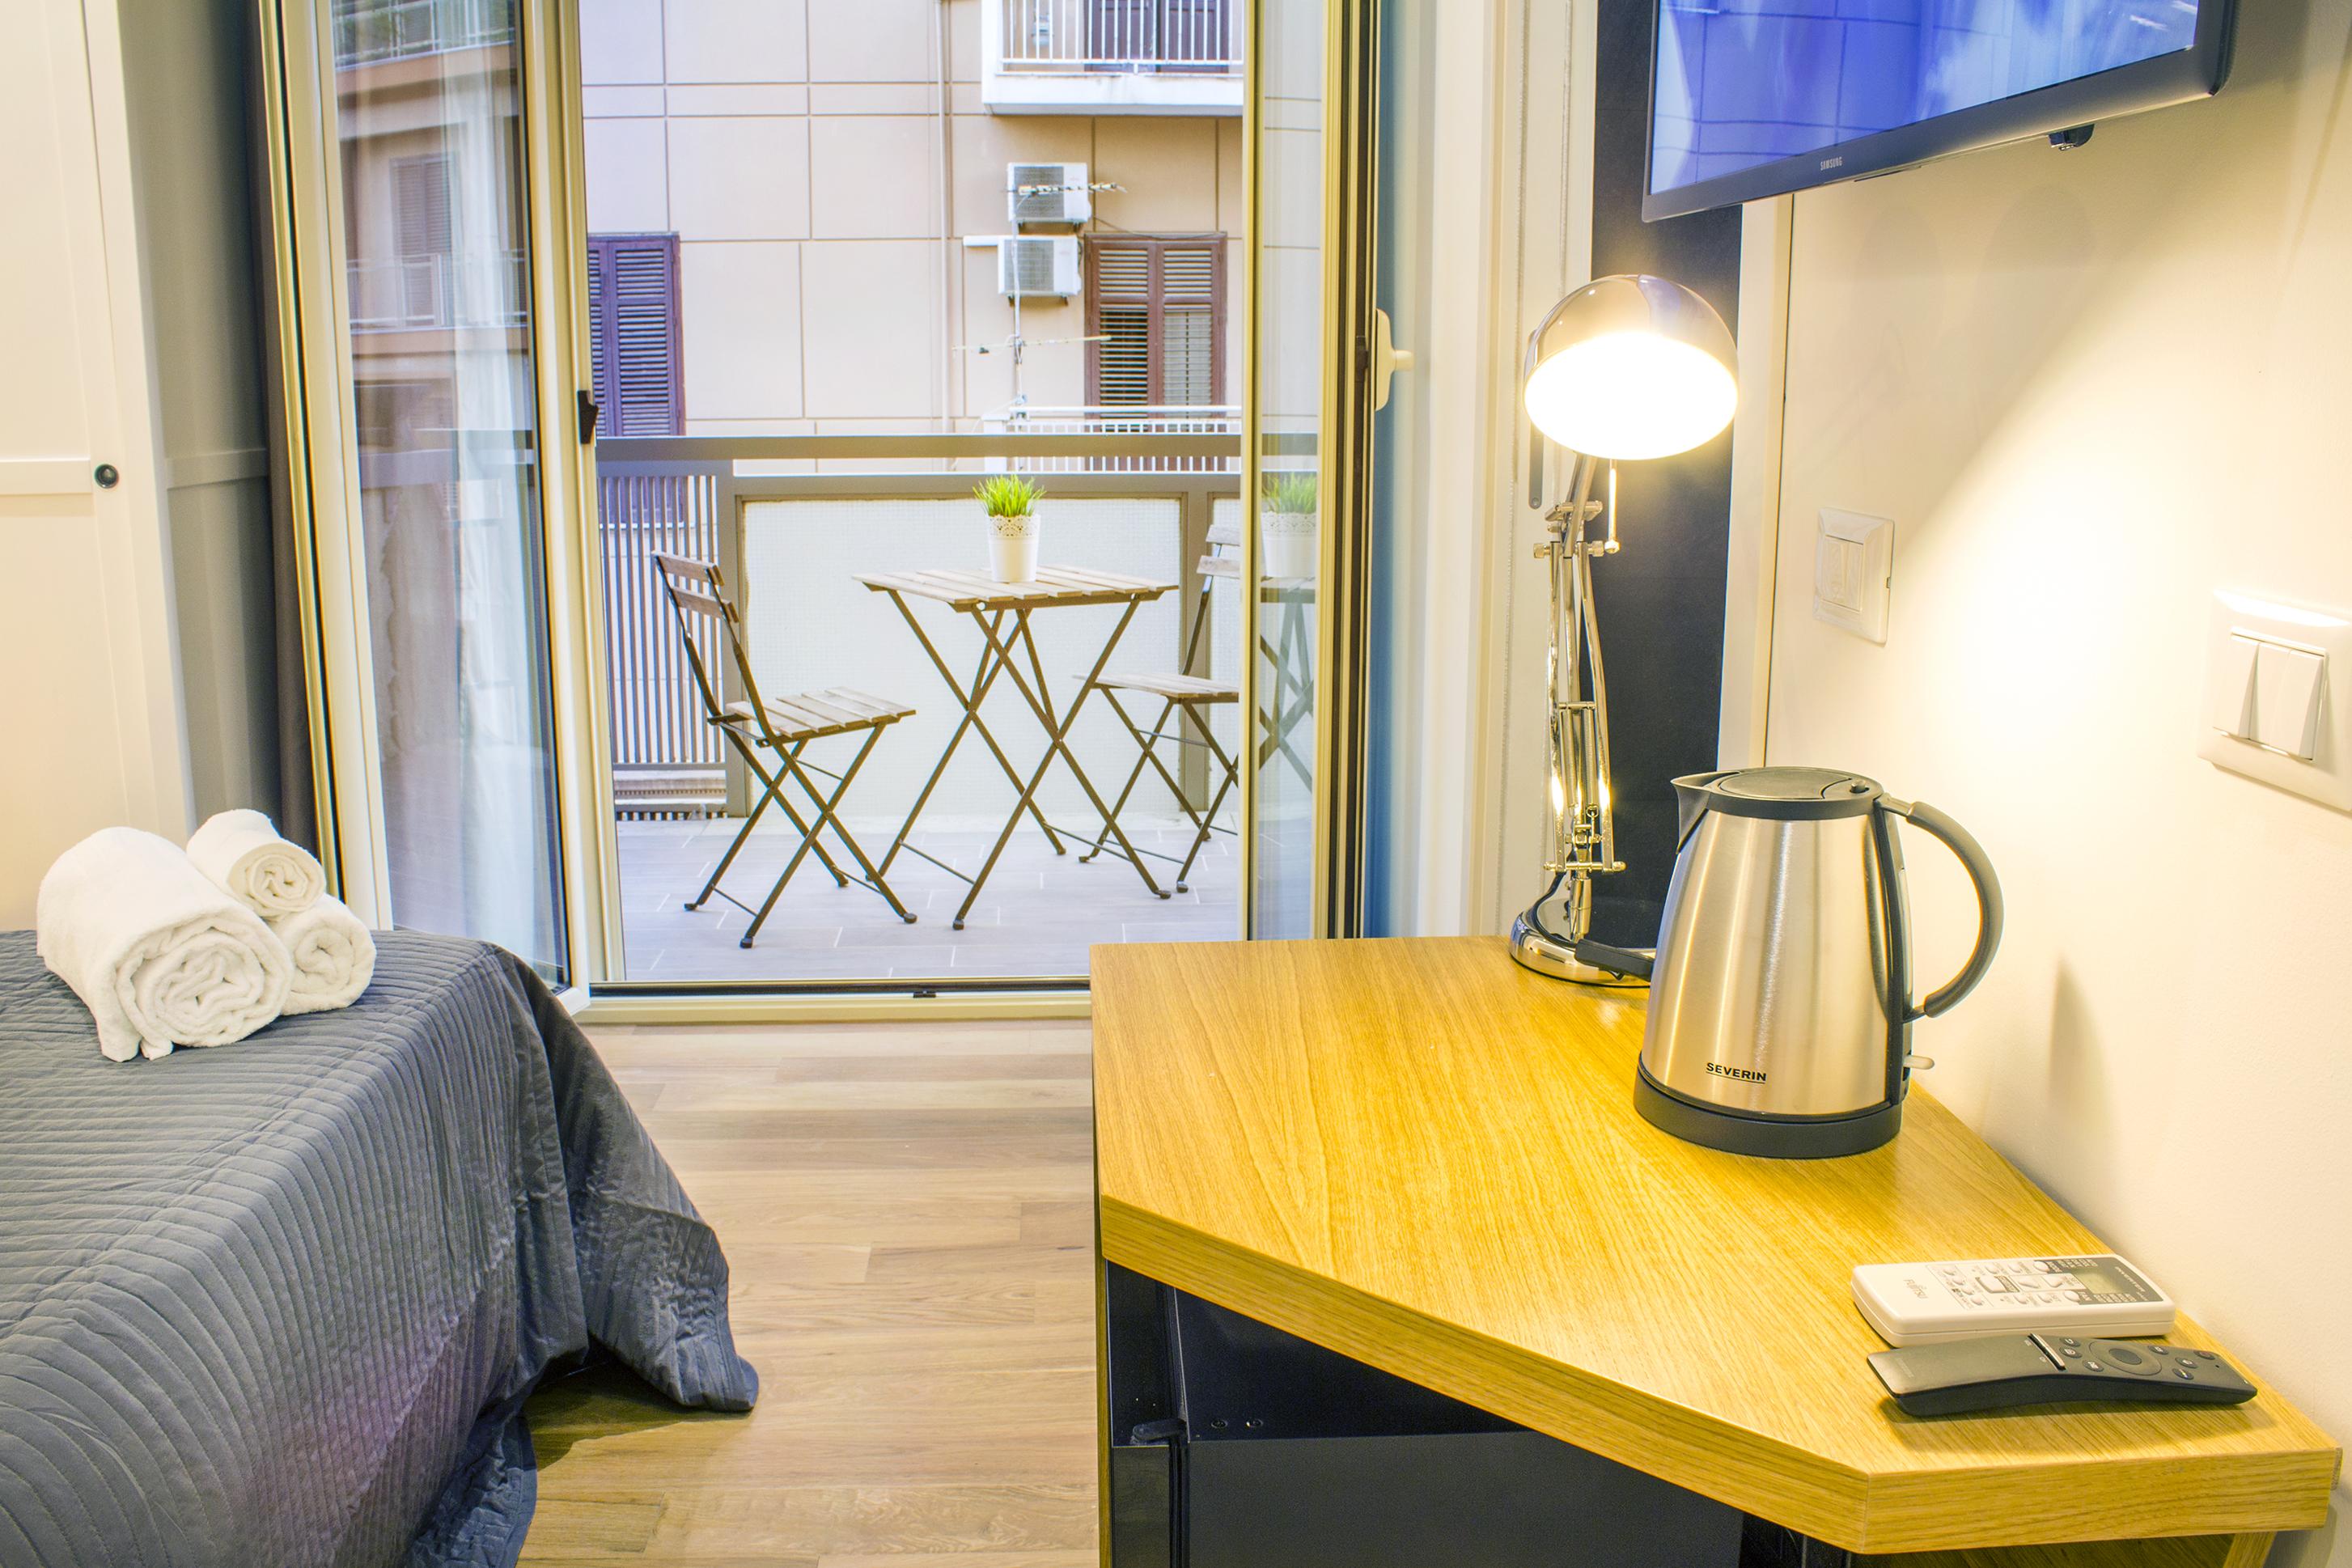 Kalamonjo suite & rooms